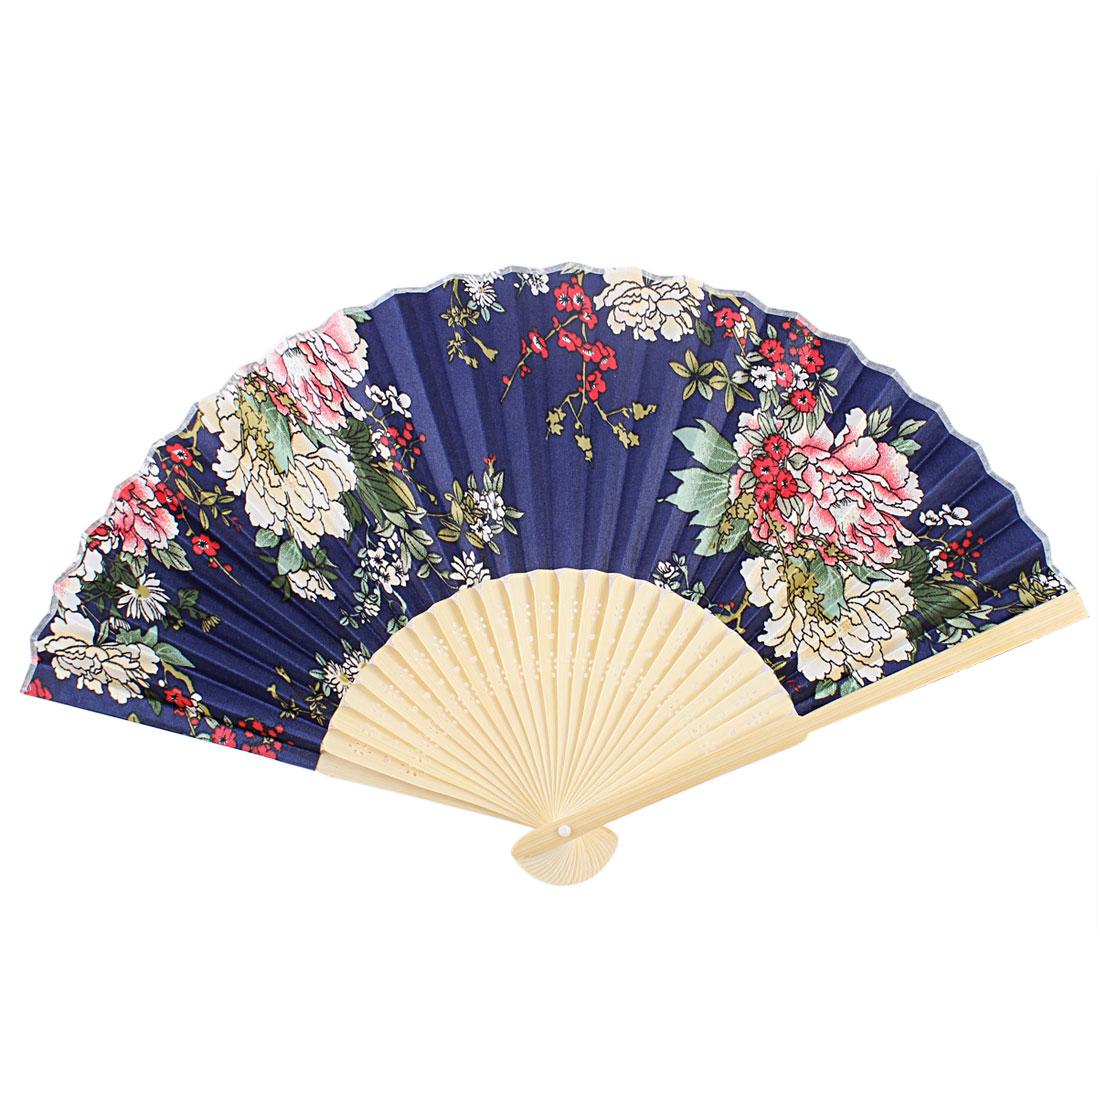 Chrysanthemum Pattern Wood Rib Foldable Portable Hand Fan Dark Blue for Lady